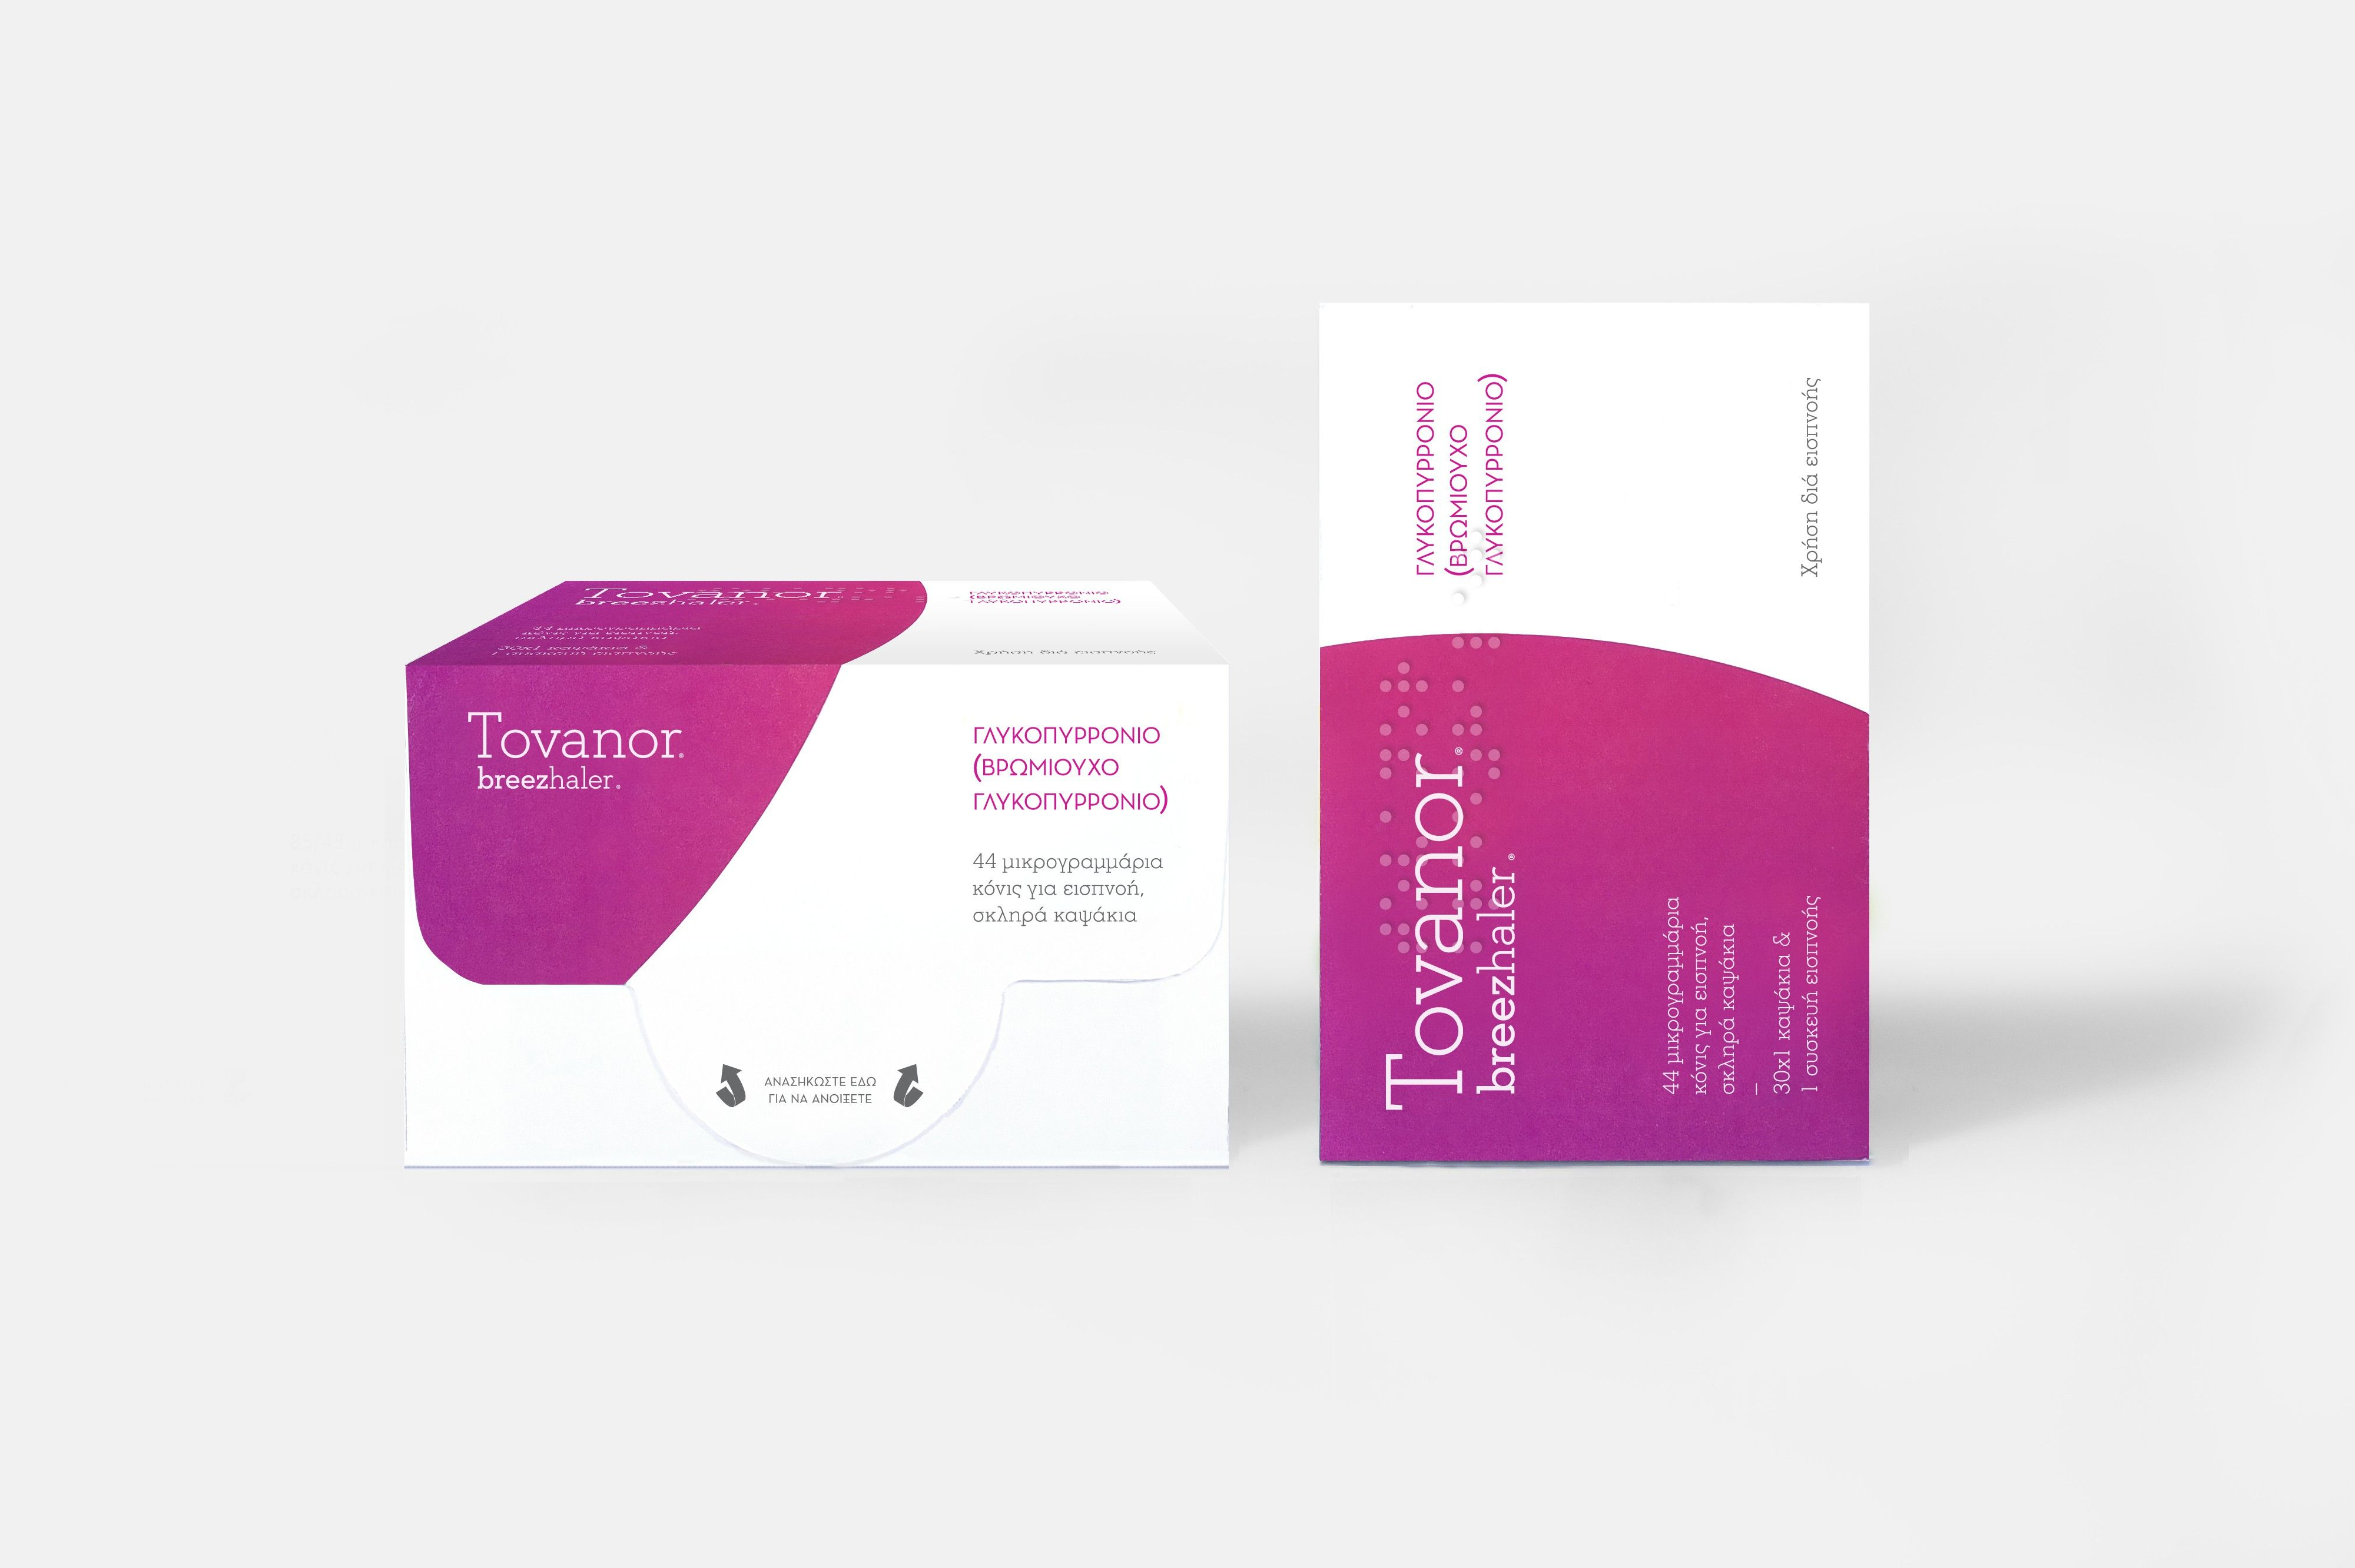 Pharma Packaging Design Trends 건강식품 포장 포장 디자인